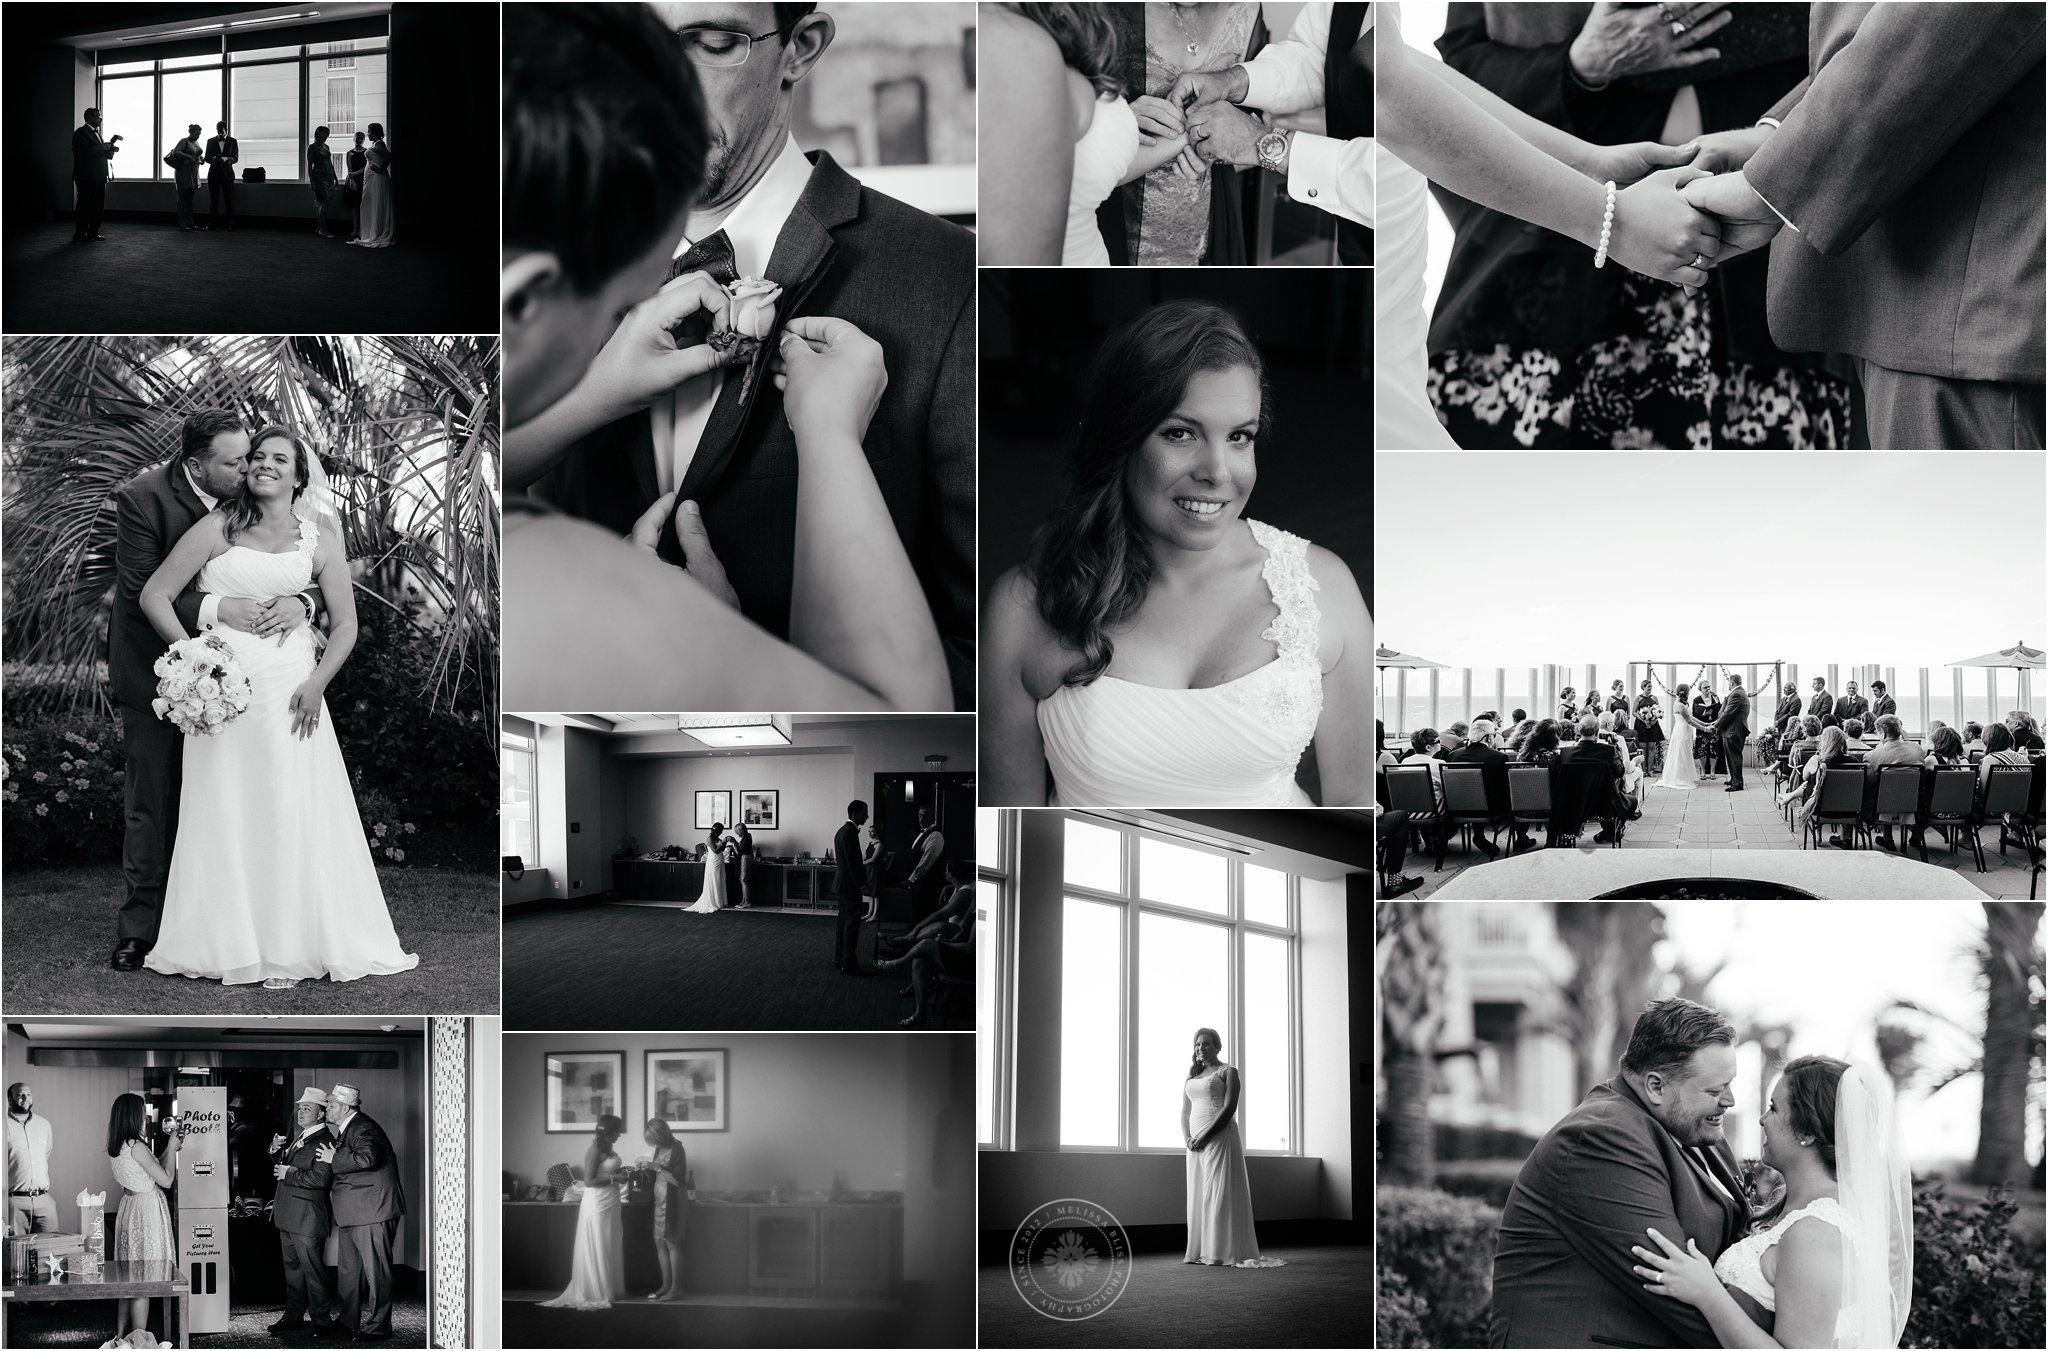 professional-wedding-photographers-in-virginia-beach-melissa-bliss-photography-oceanfront-wedding-inspiration-real-weddings-va-bride-melissa-bliss-photography